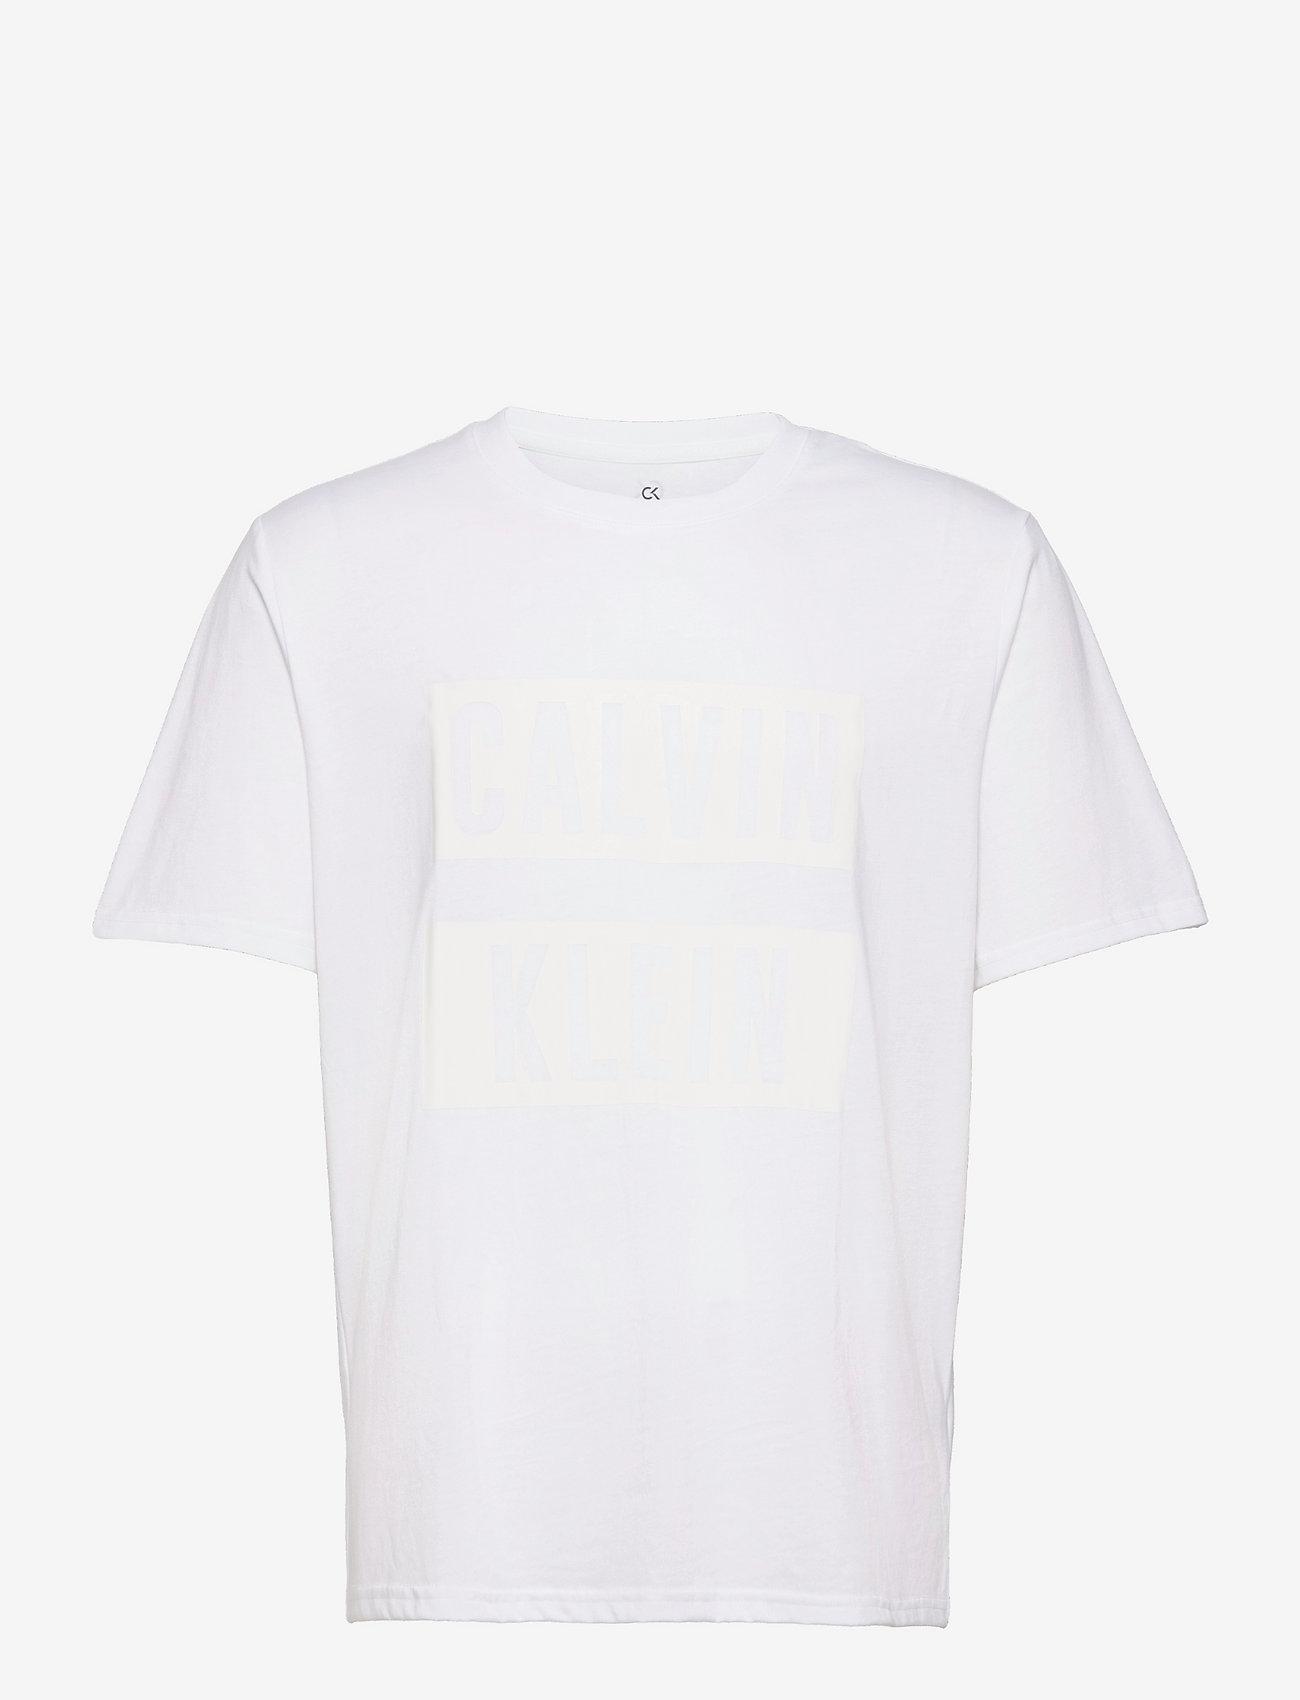 Calvin Klein Performance - PW - S/S T-SHIRT - t-shirts - bright white - 0